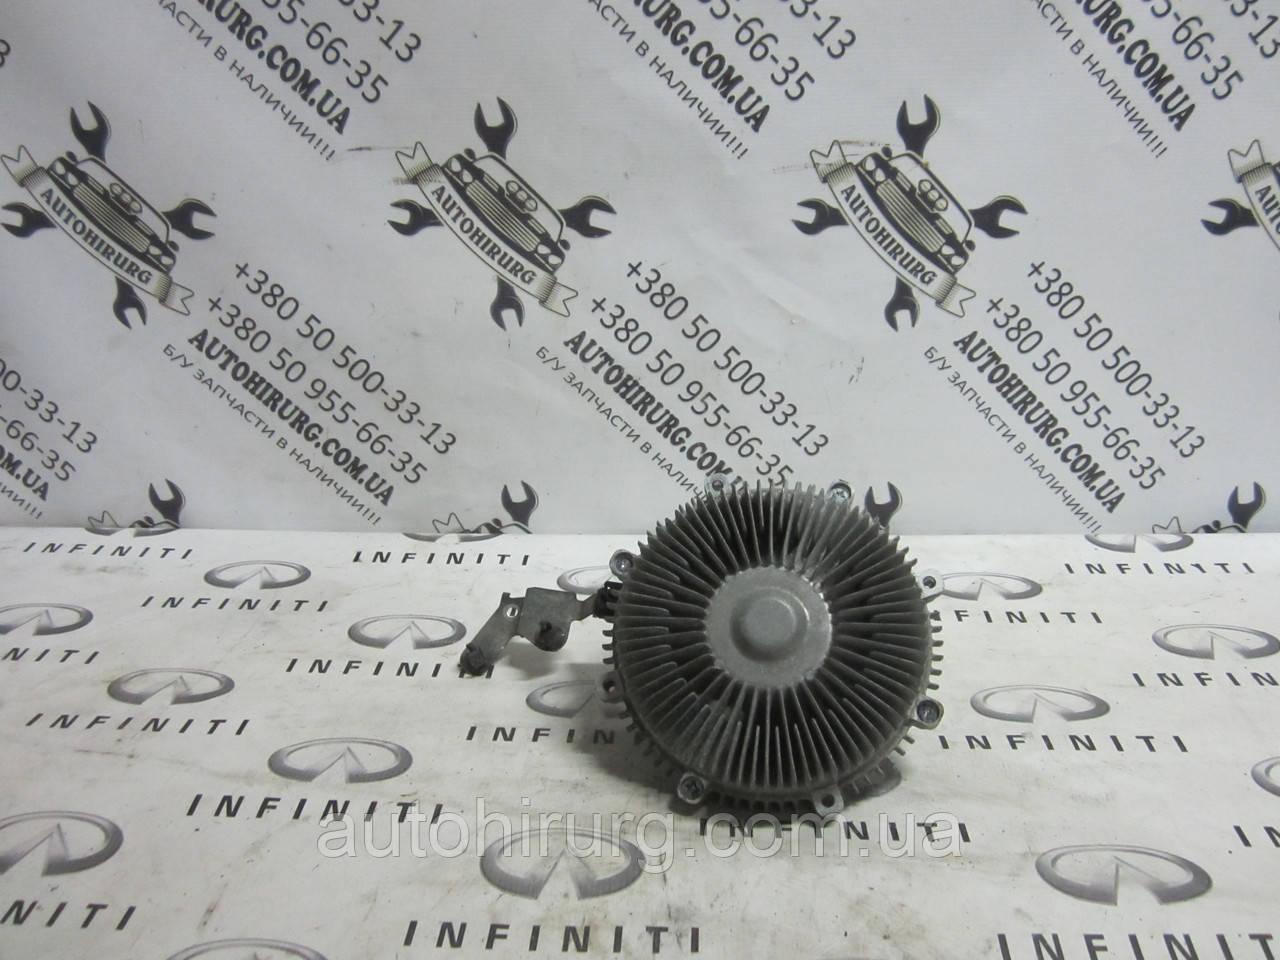 Вискомуфта Infiniti Qx56 / Qx80 - Z62, фото 1